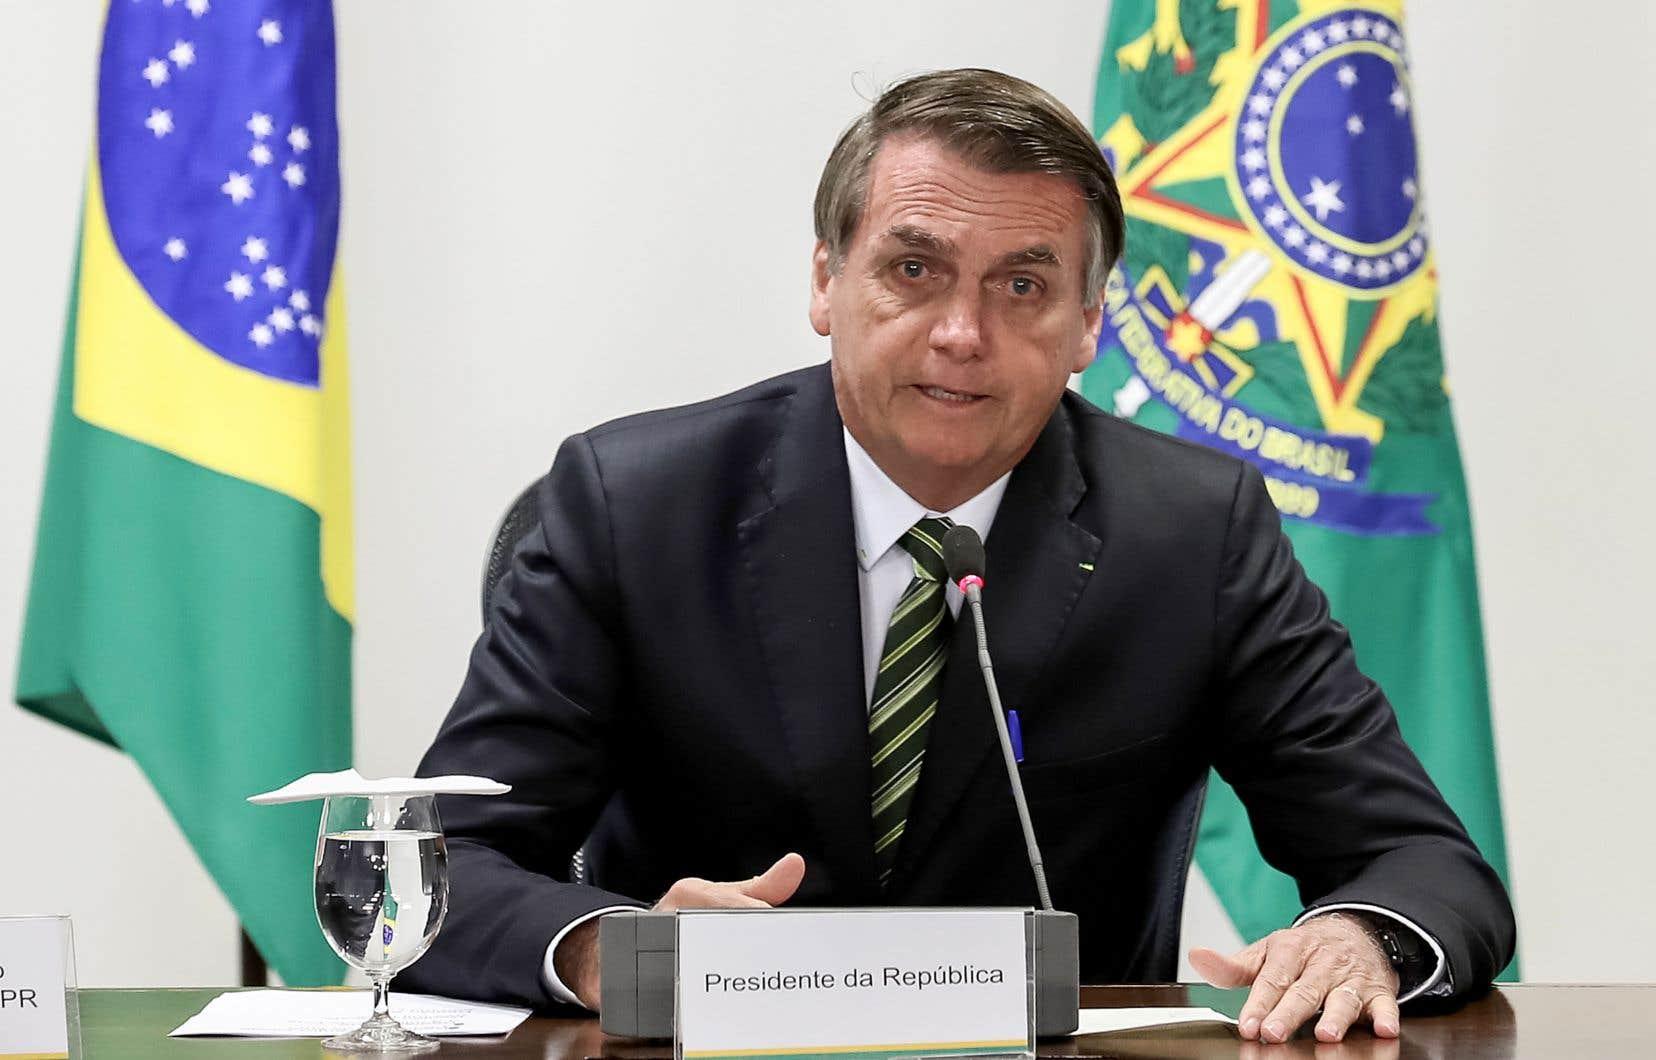 Le président brésilienJair Bolsonaro